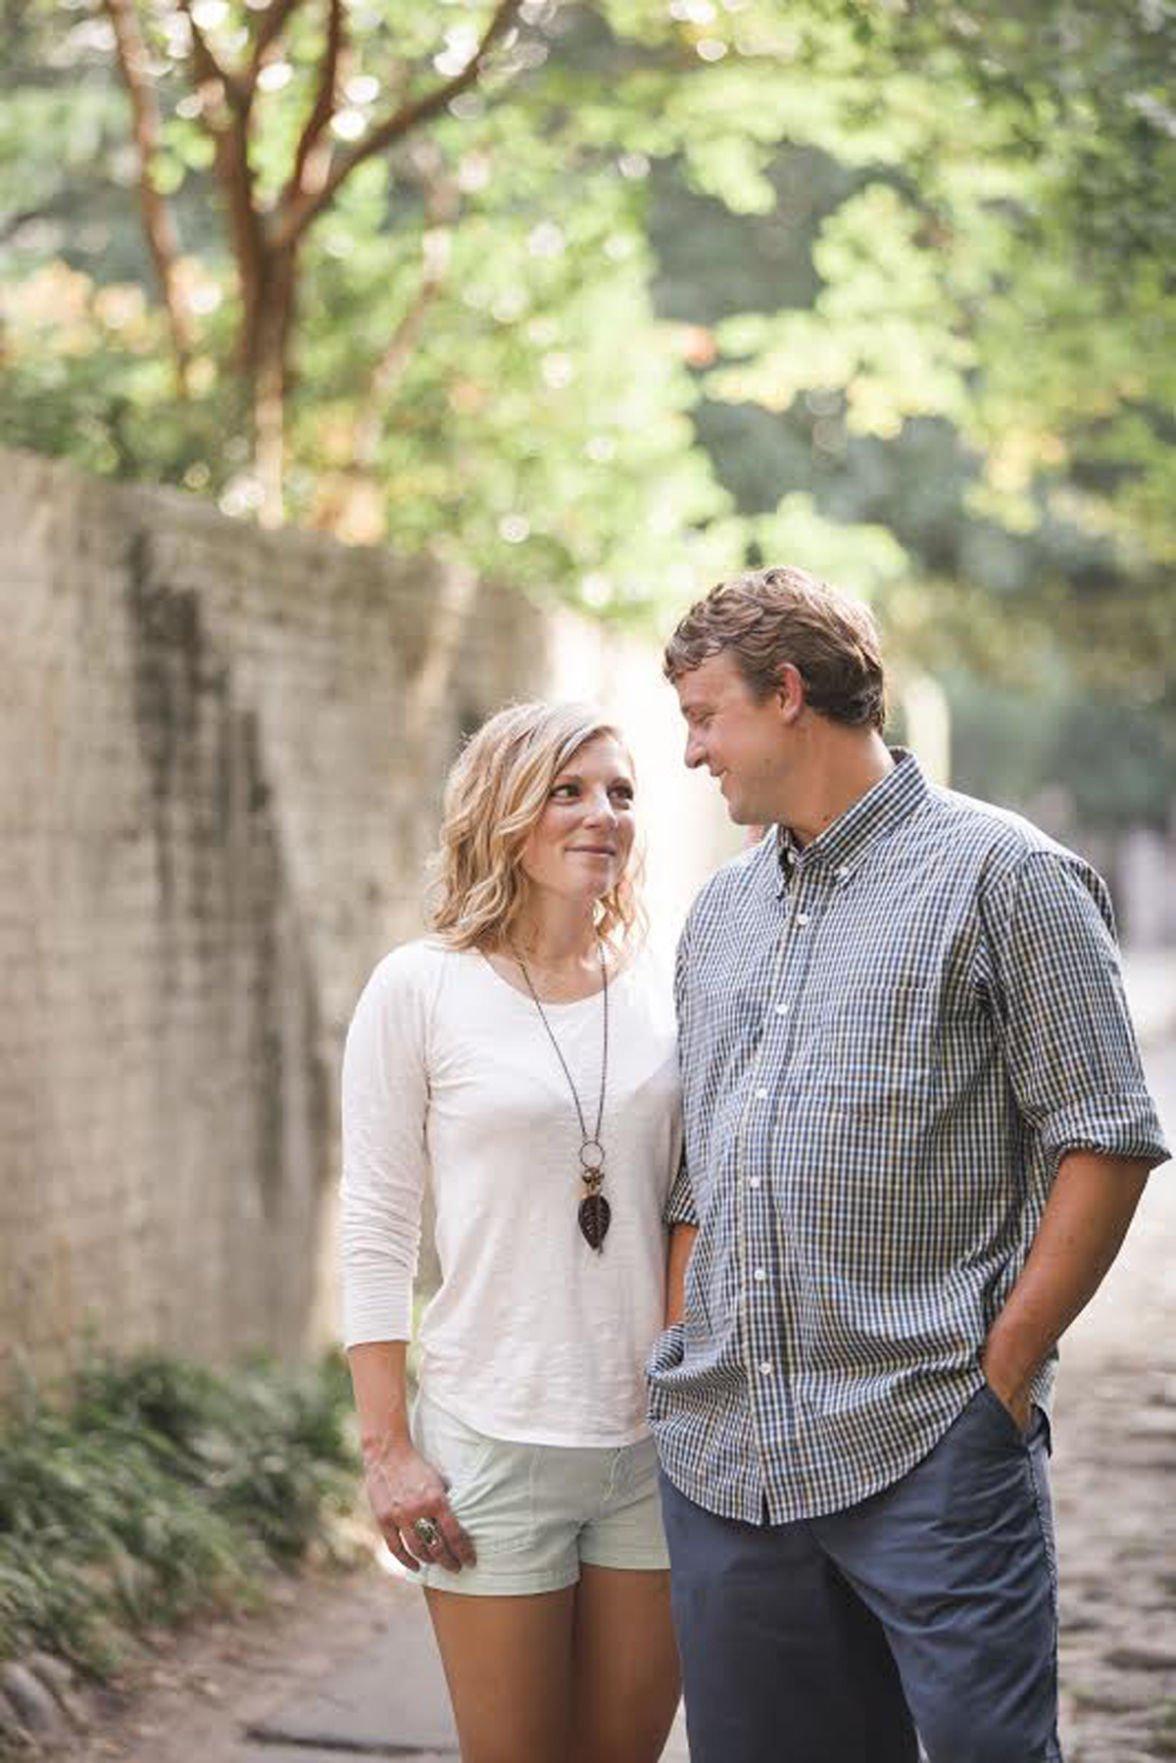 Lauren Atwell and Matthew Housley